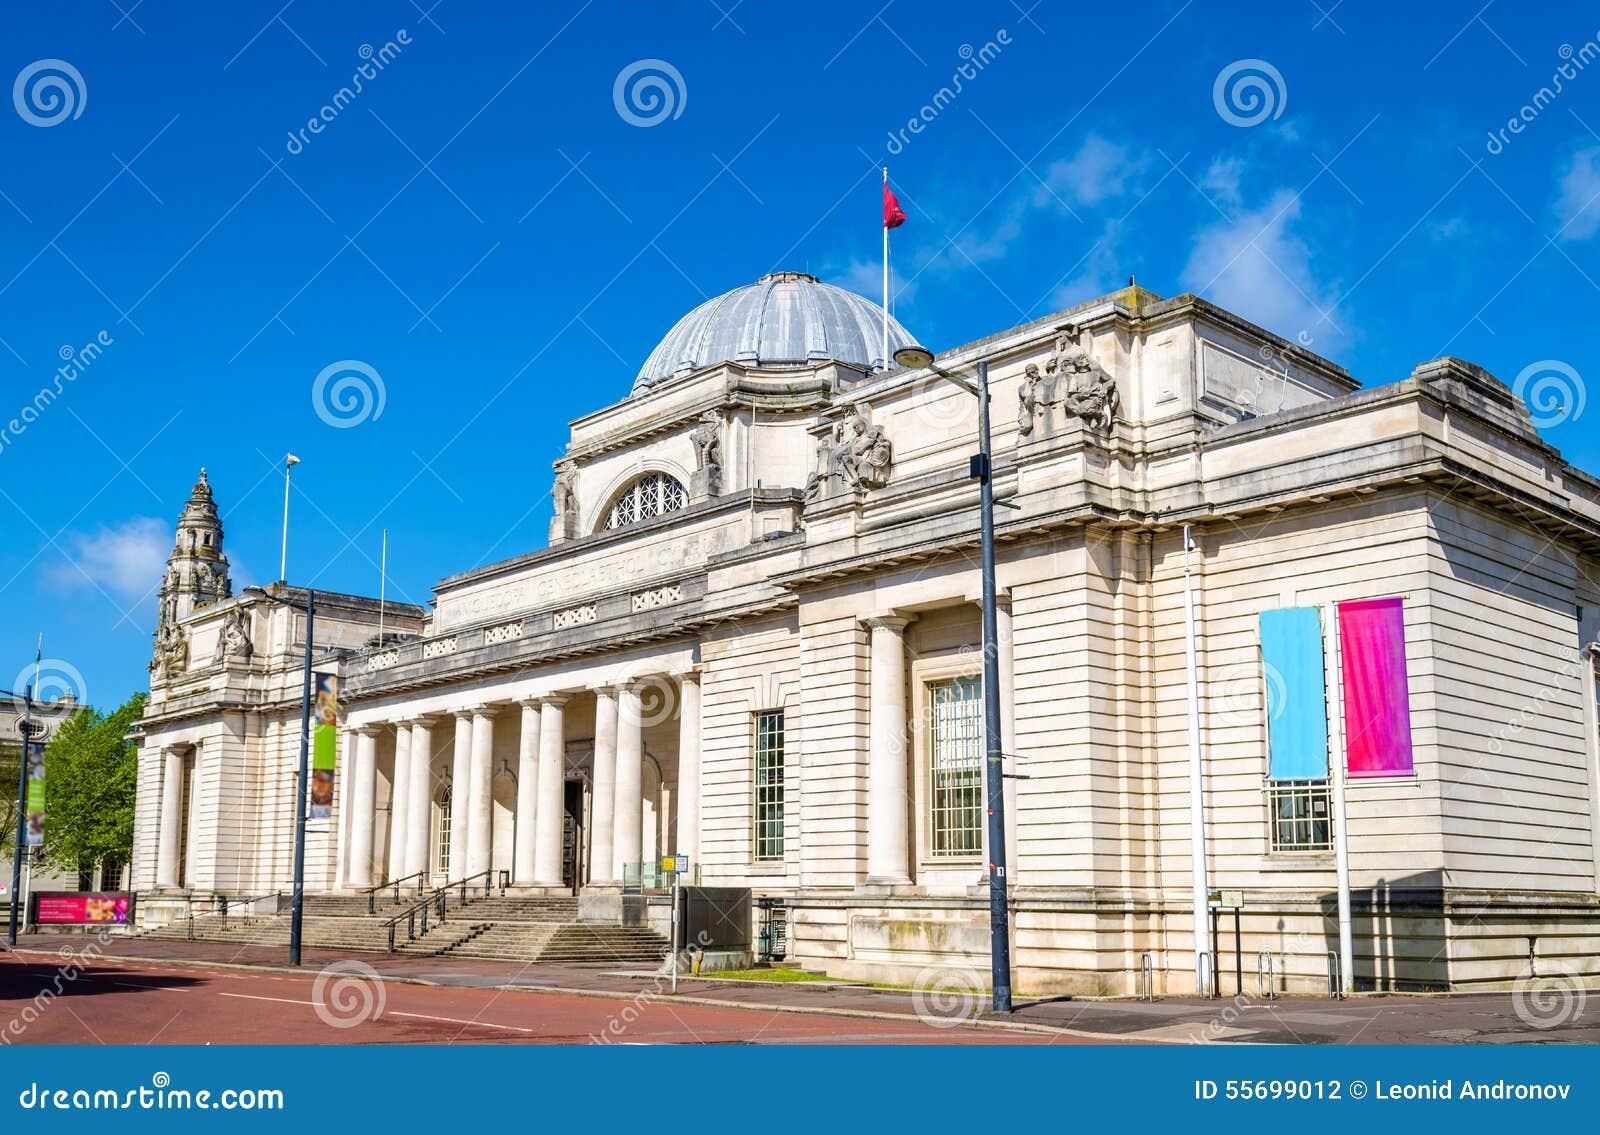 Nationaal Museum van Wales in Cardiff